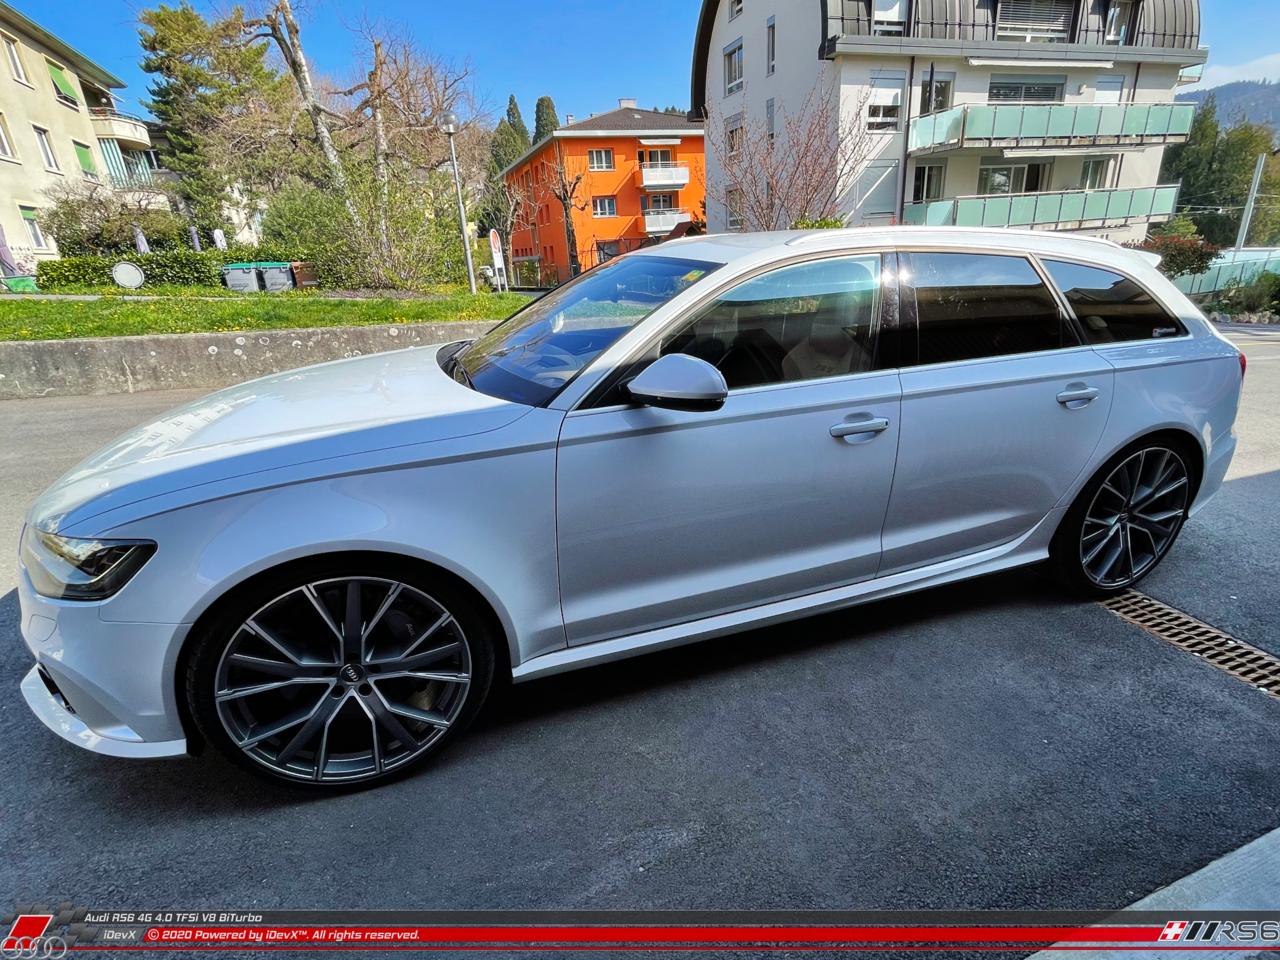 03.04.2021_Audi-RS6_iDevX_006.png